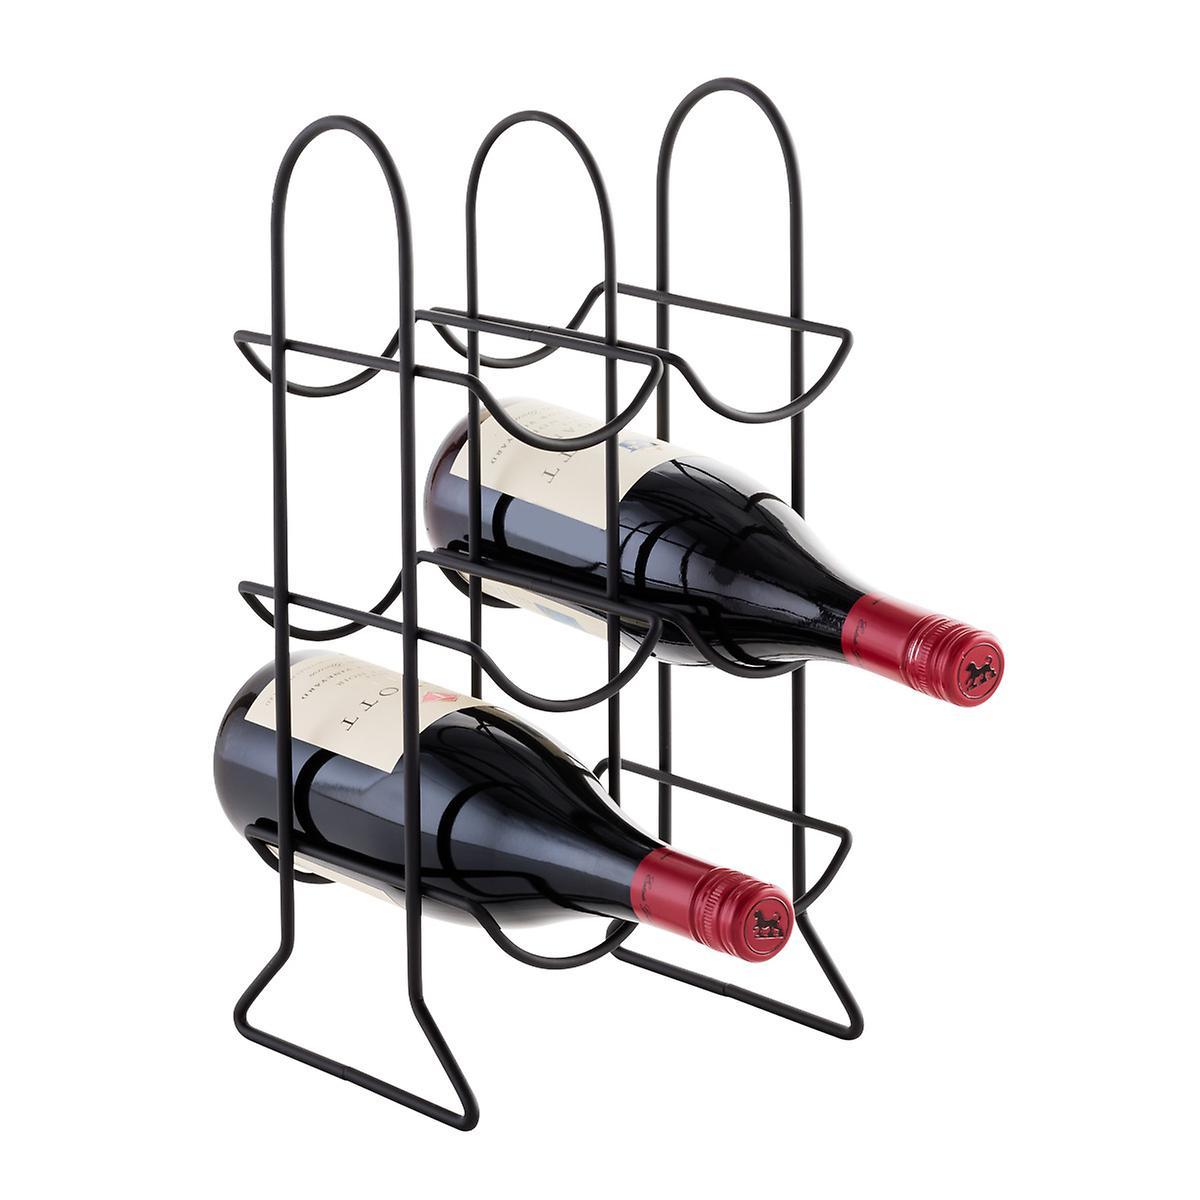 Q A 1 Question Answer 6 Bottle Wine Rack